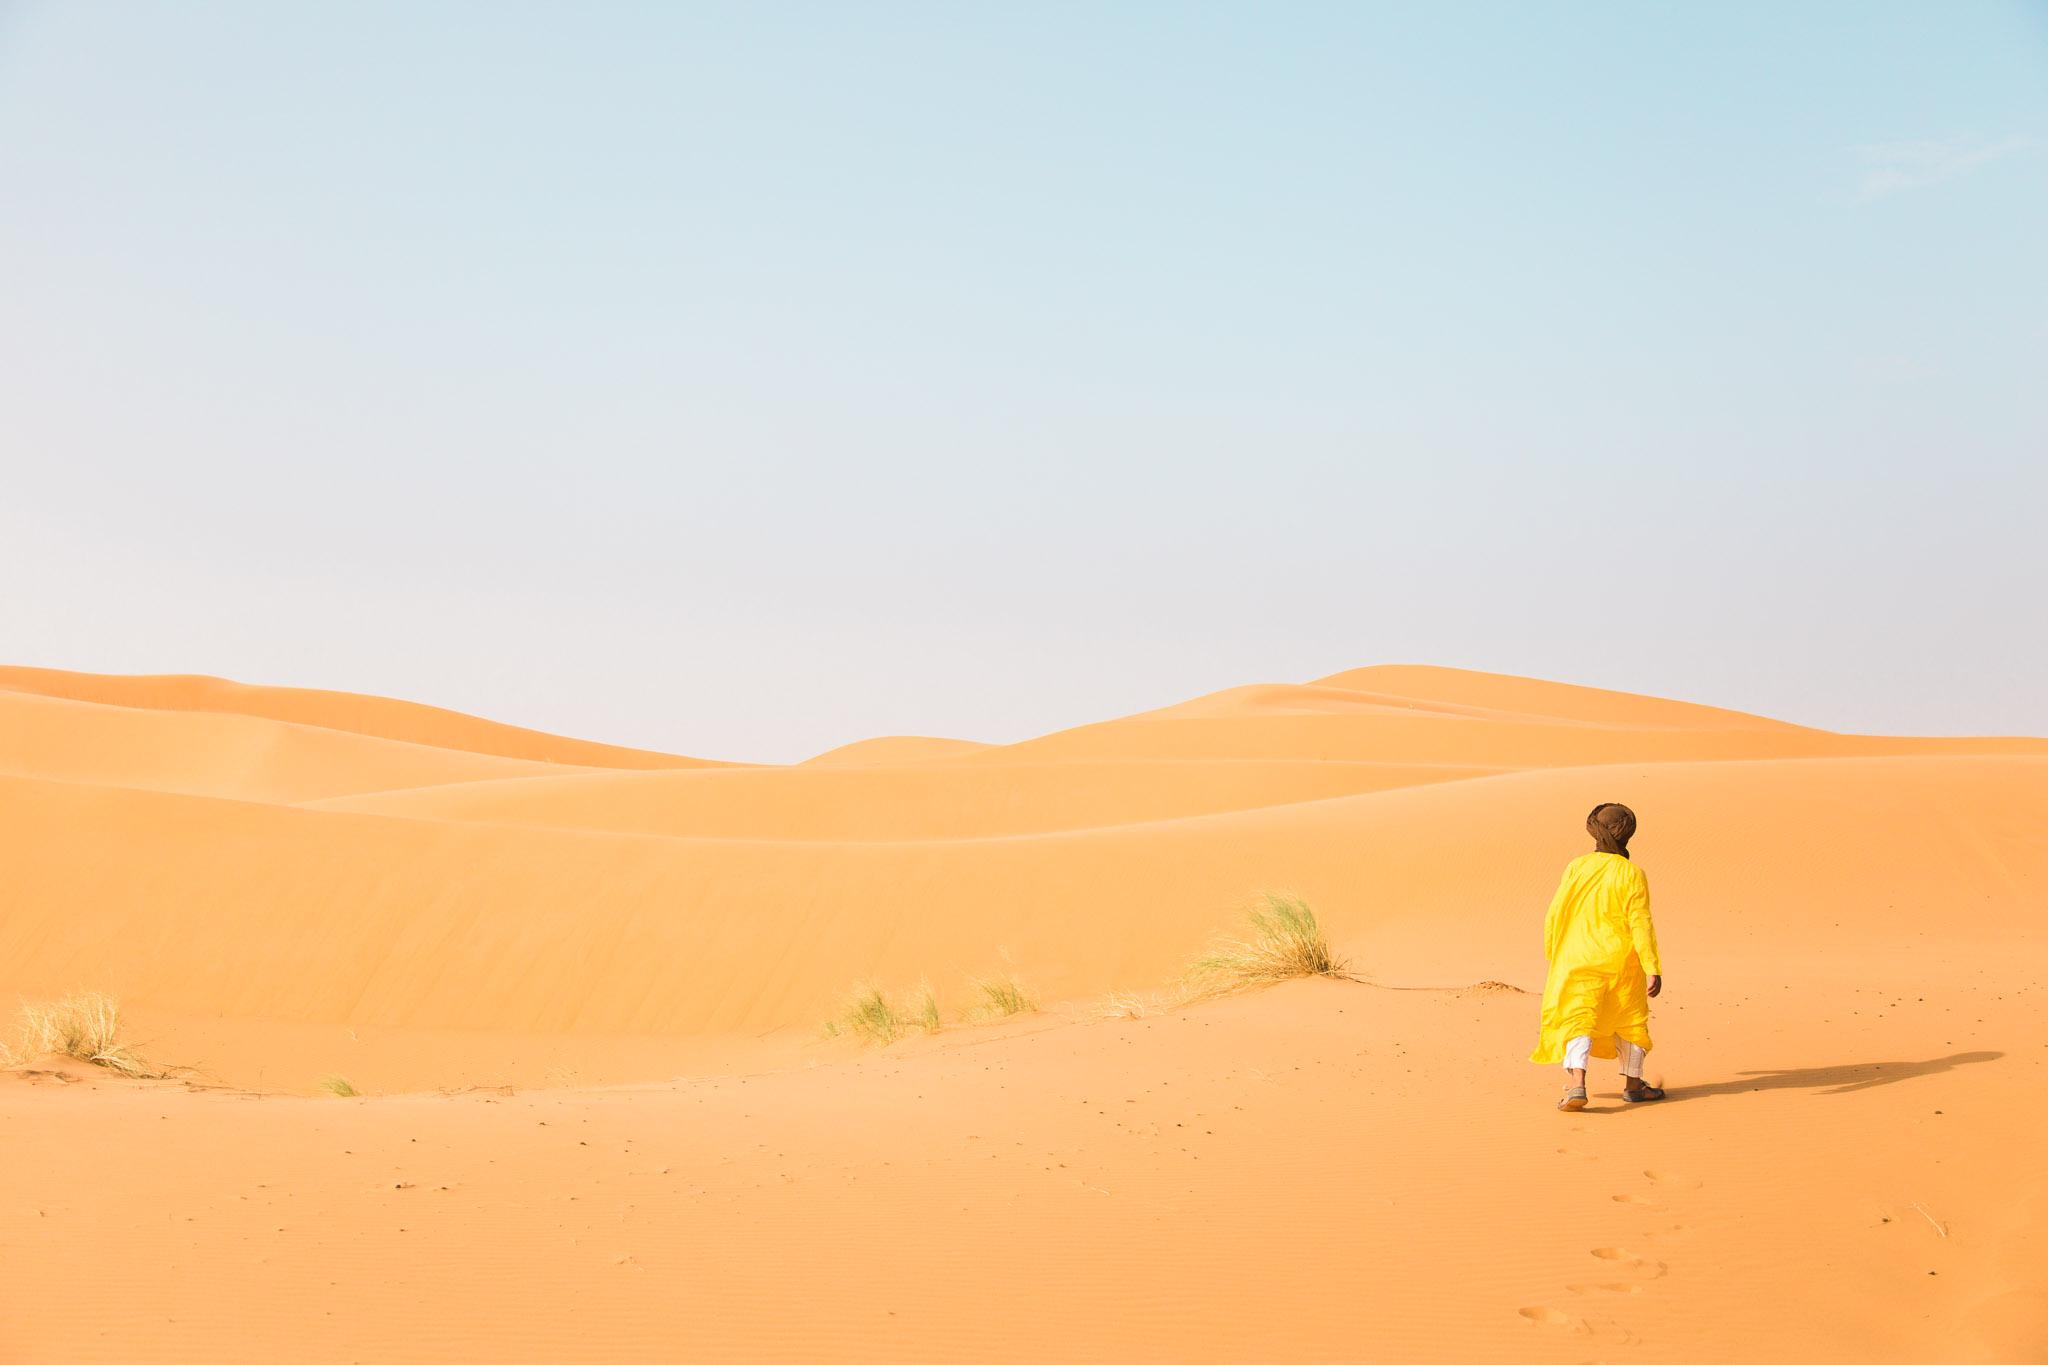 morocco-sahara-erg-chebbi-desert-tour-1.jpg